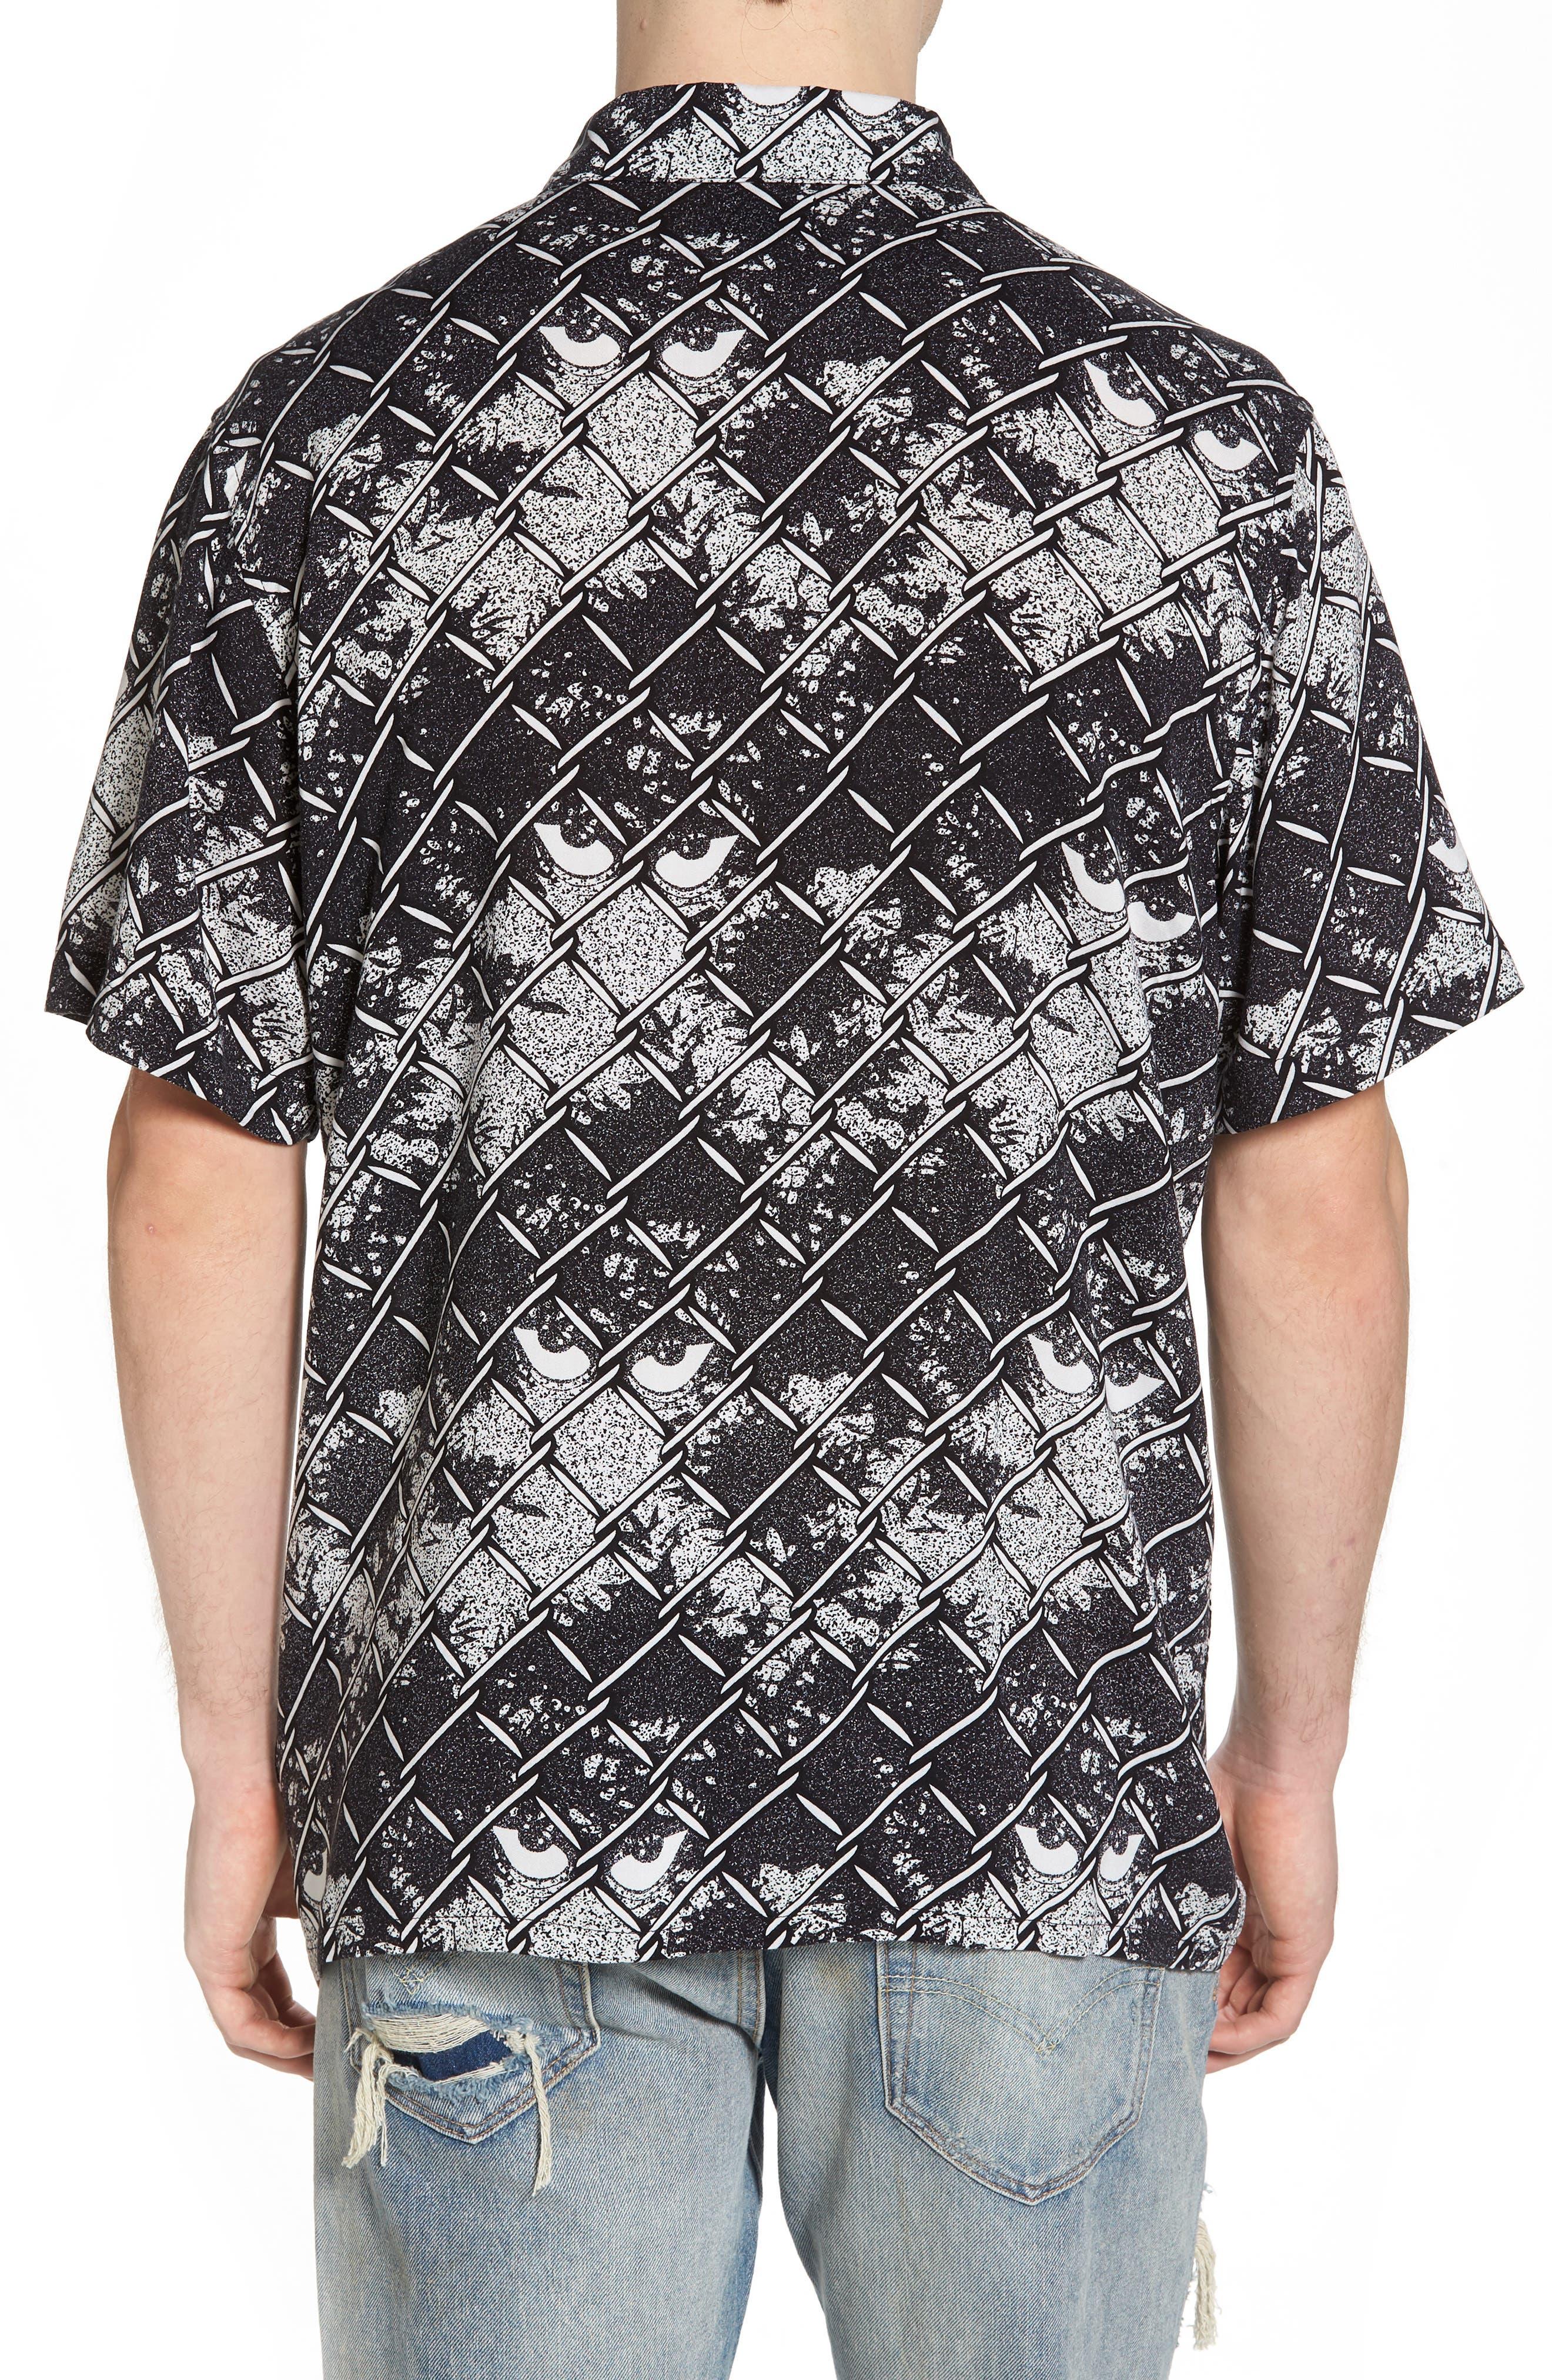 Gatekeeper Short Sleeve Shirt,                             Alternate thumbnail 2, color,                             002